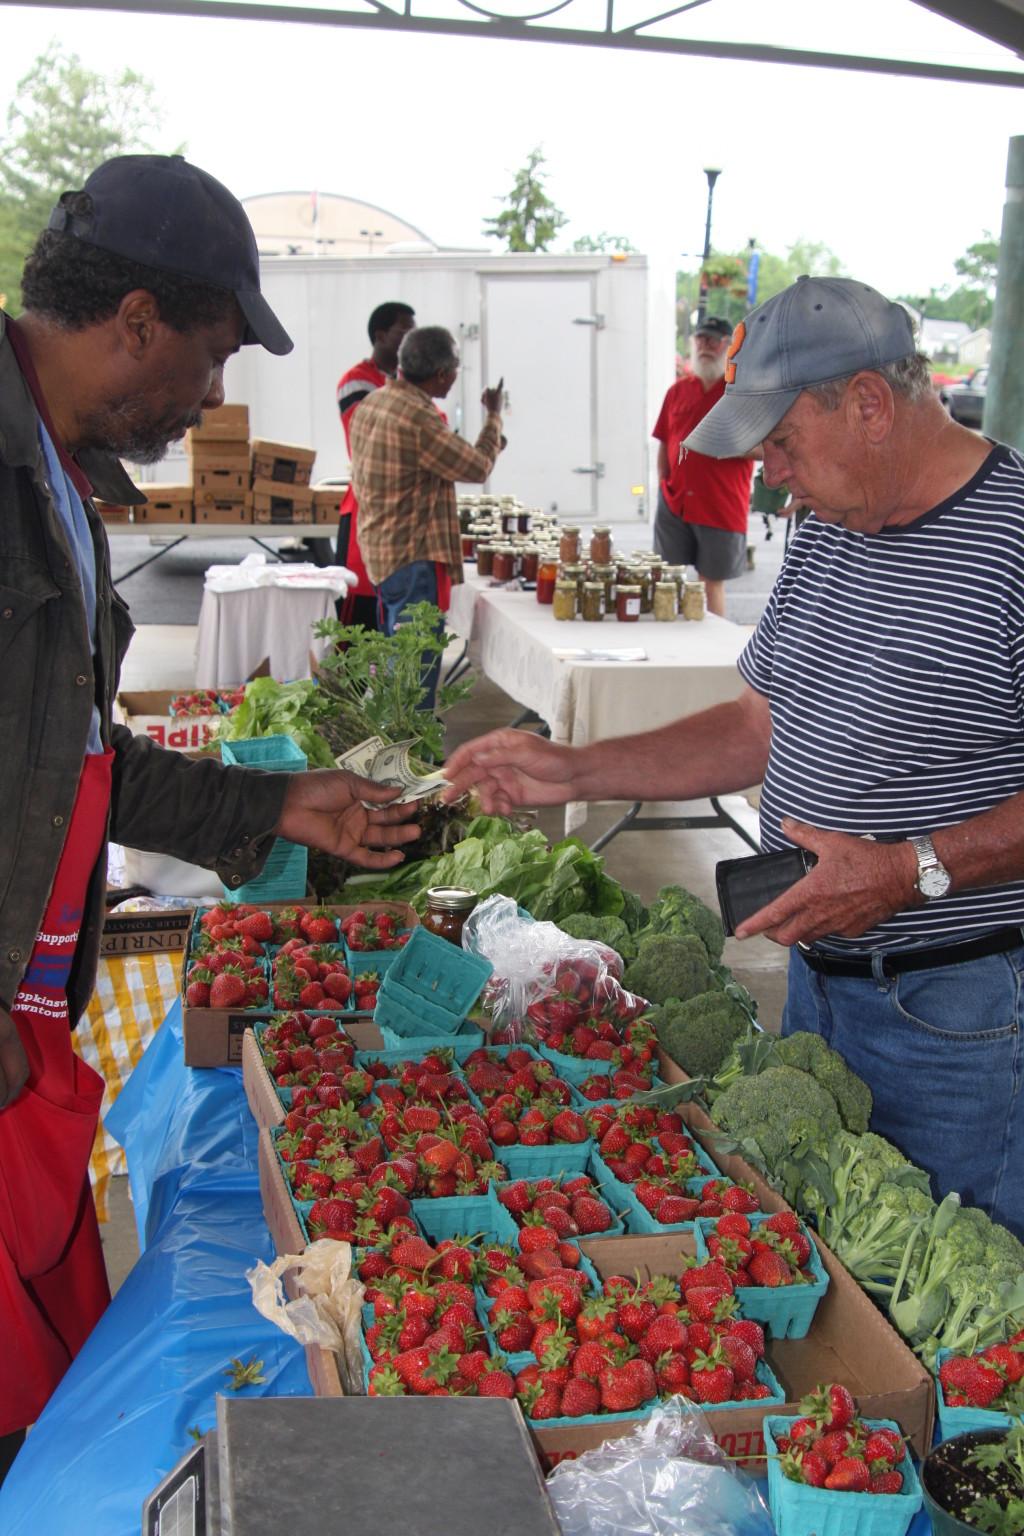 Downtown Hopkinsville Farmers Market – Visit Hopkinsville